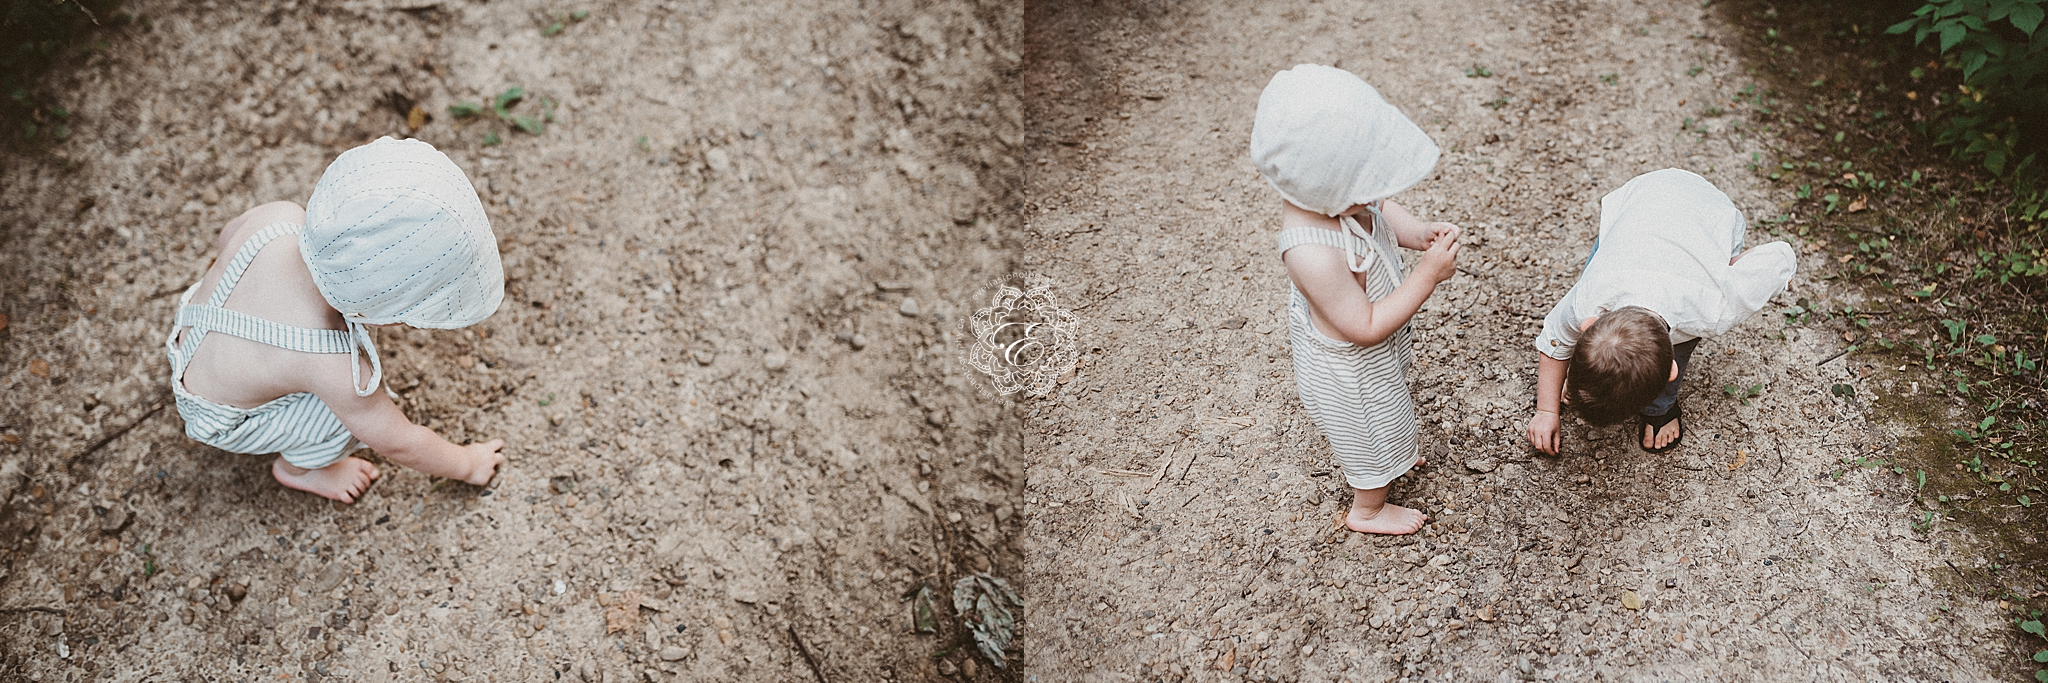 edmonton-childrens-photographers-outdoor.jpg